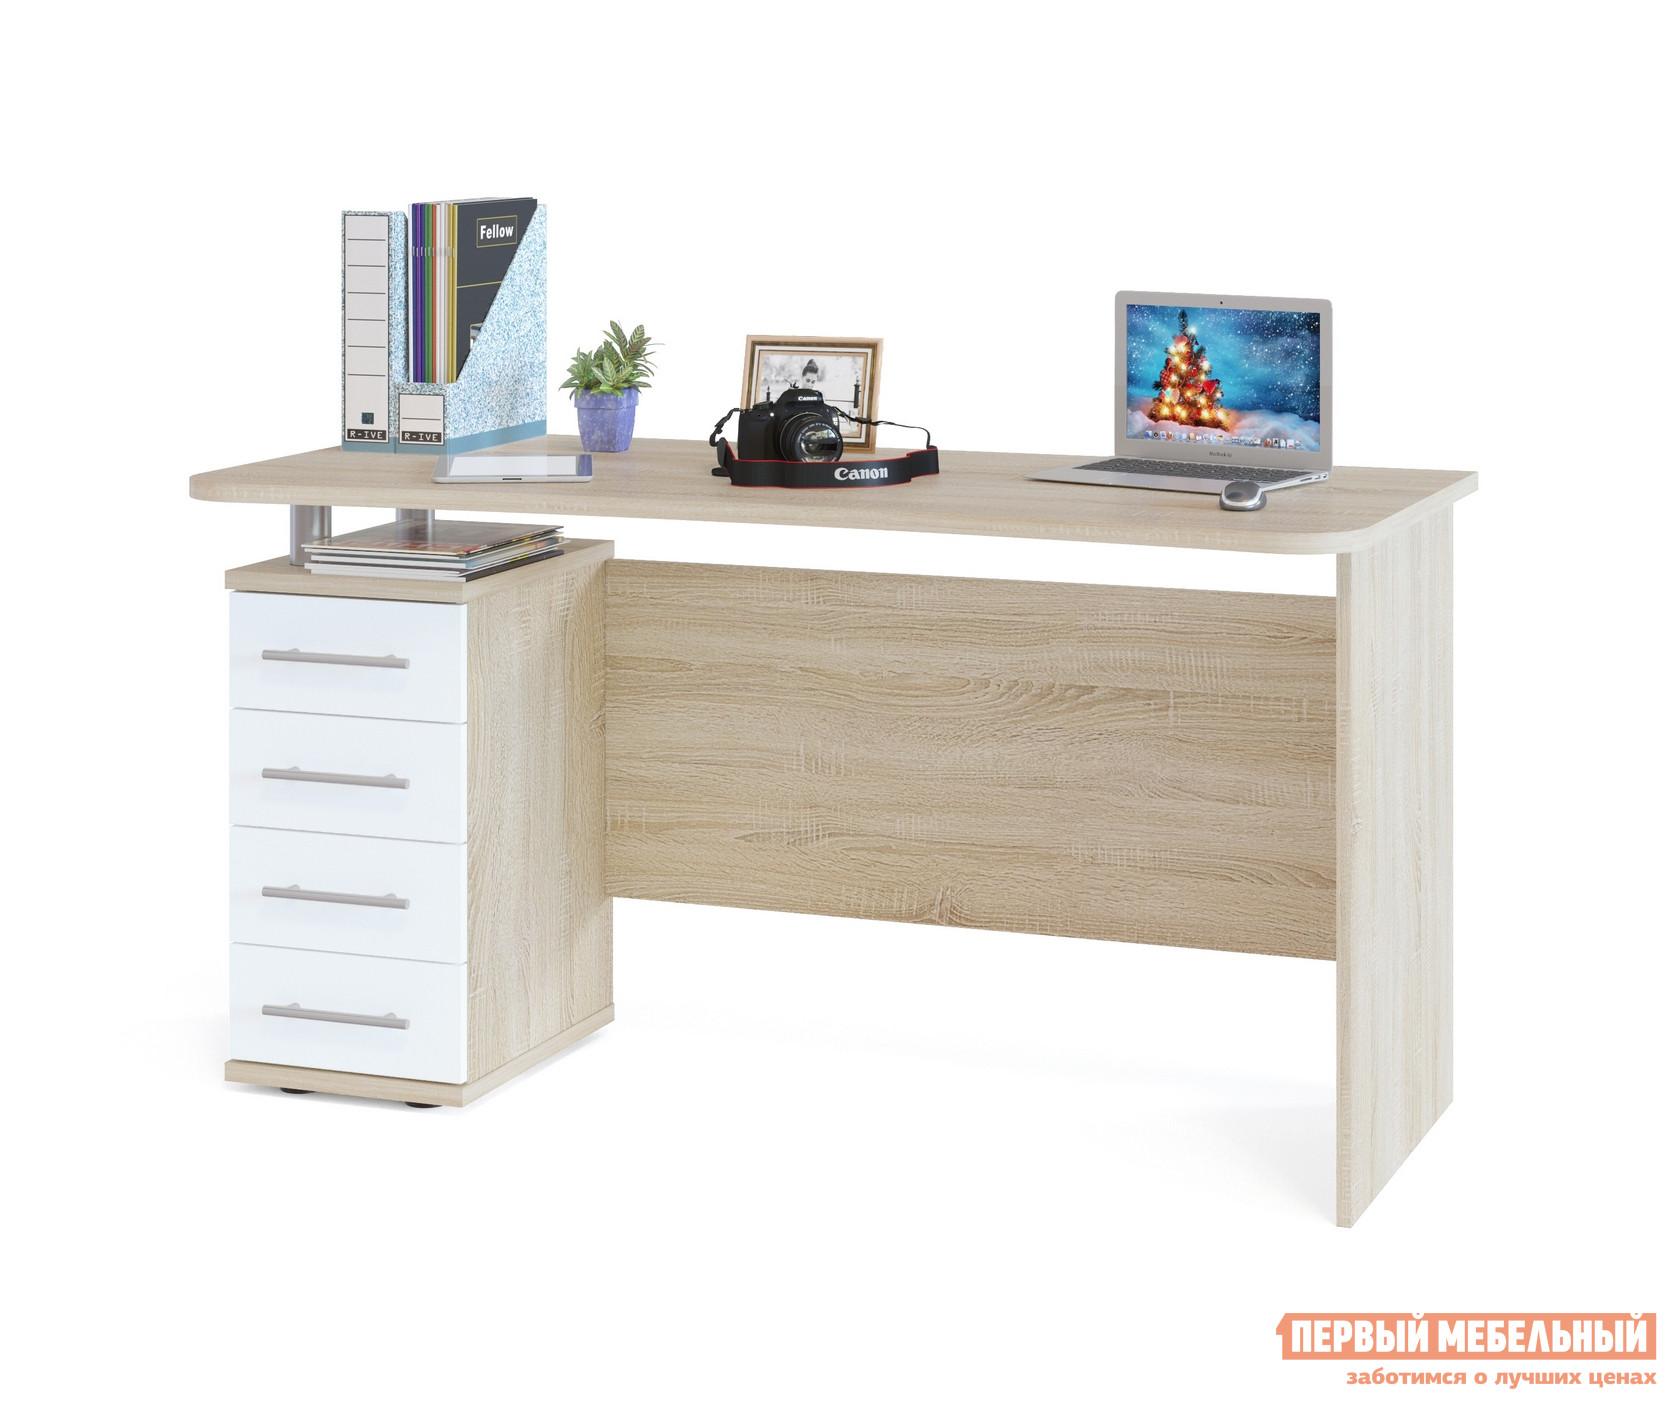 Компьютерный стол Сокол КСТ-105.1 Корпус Венге / Фасад Беленый дуб